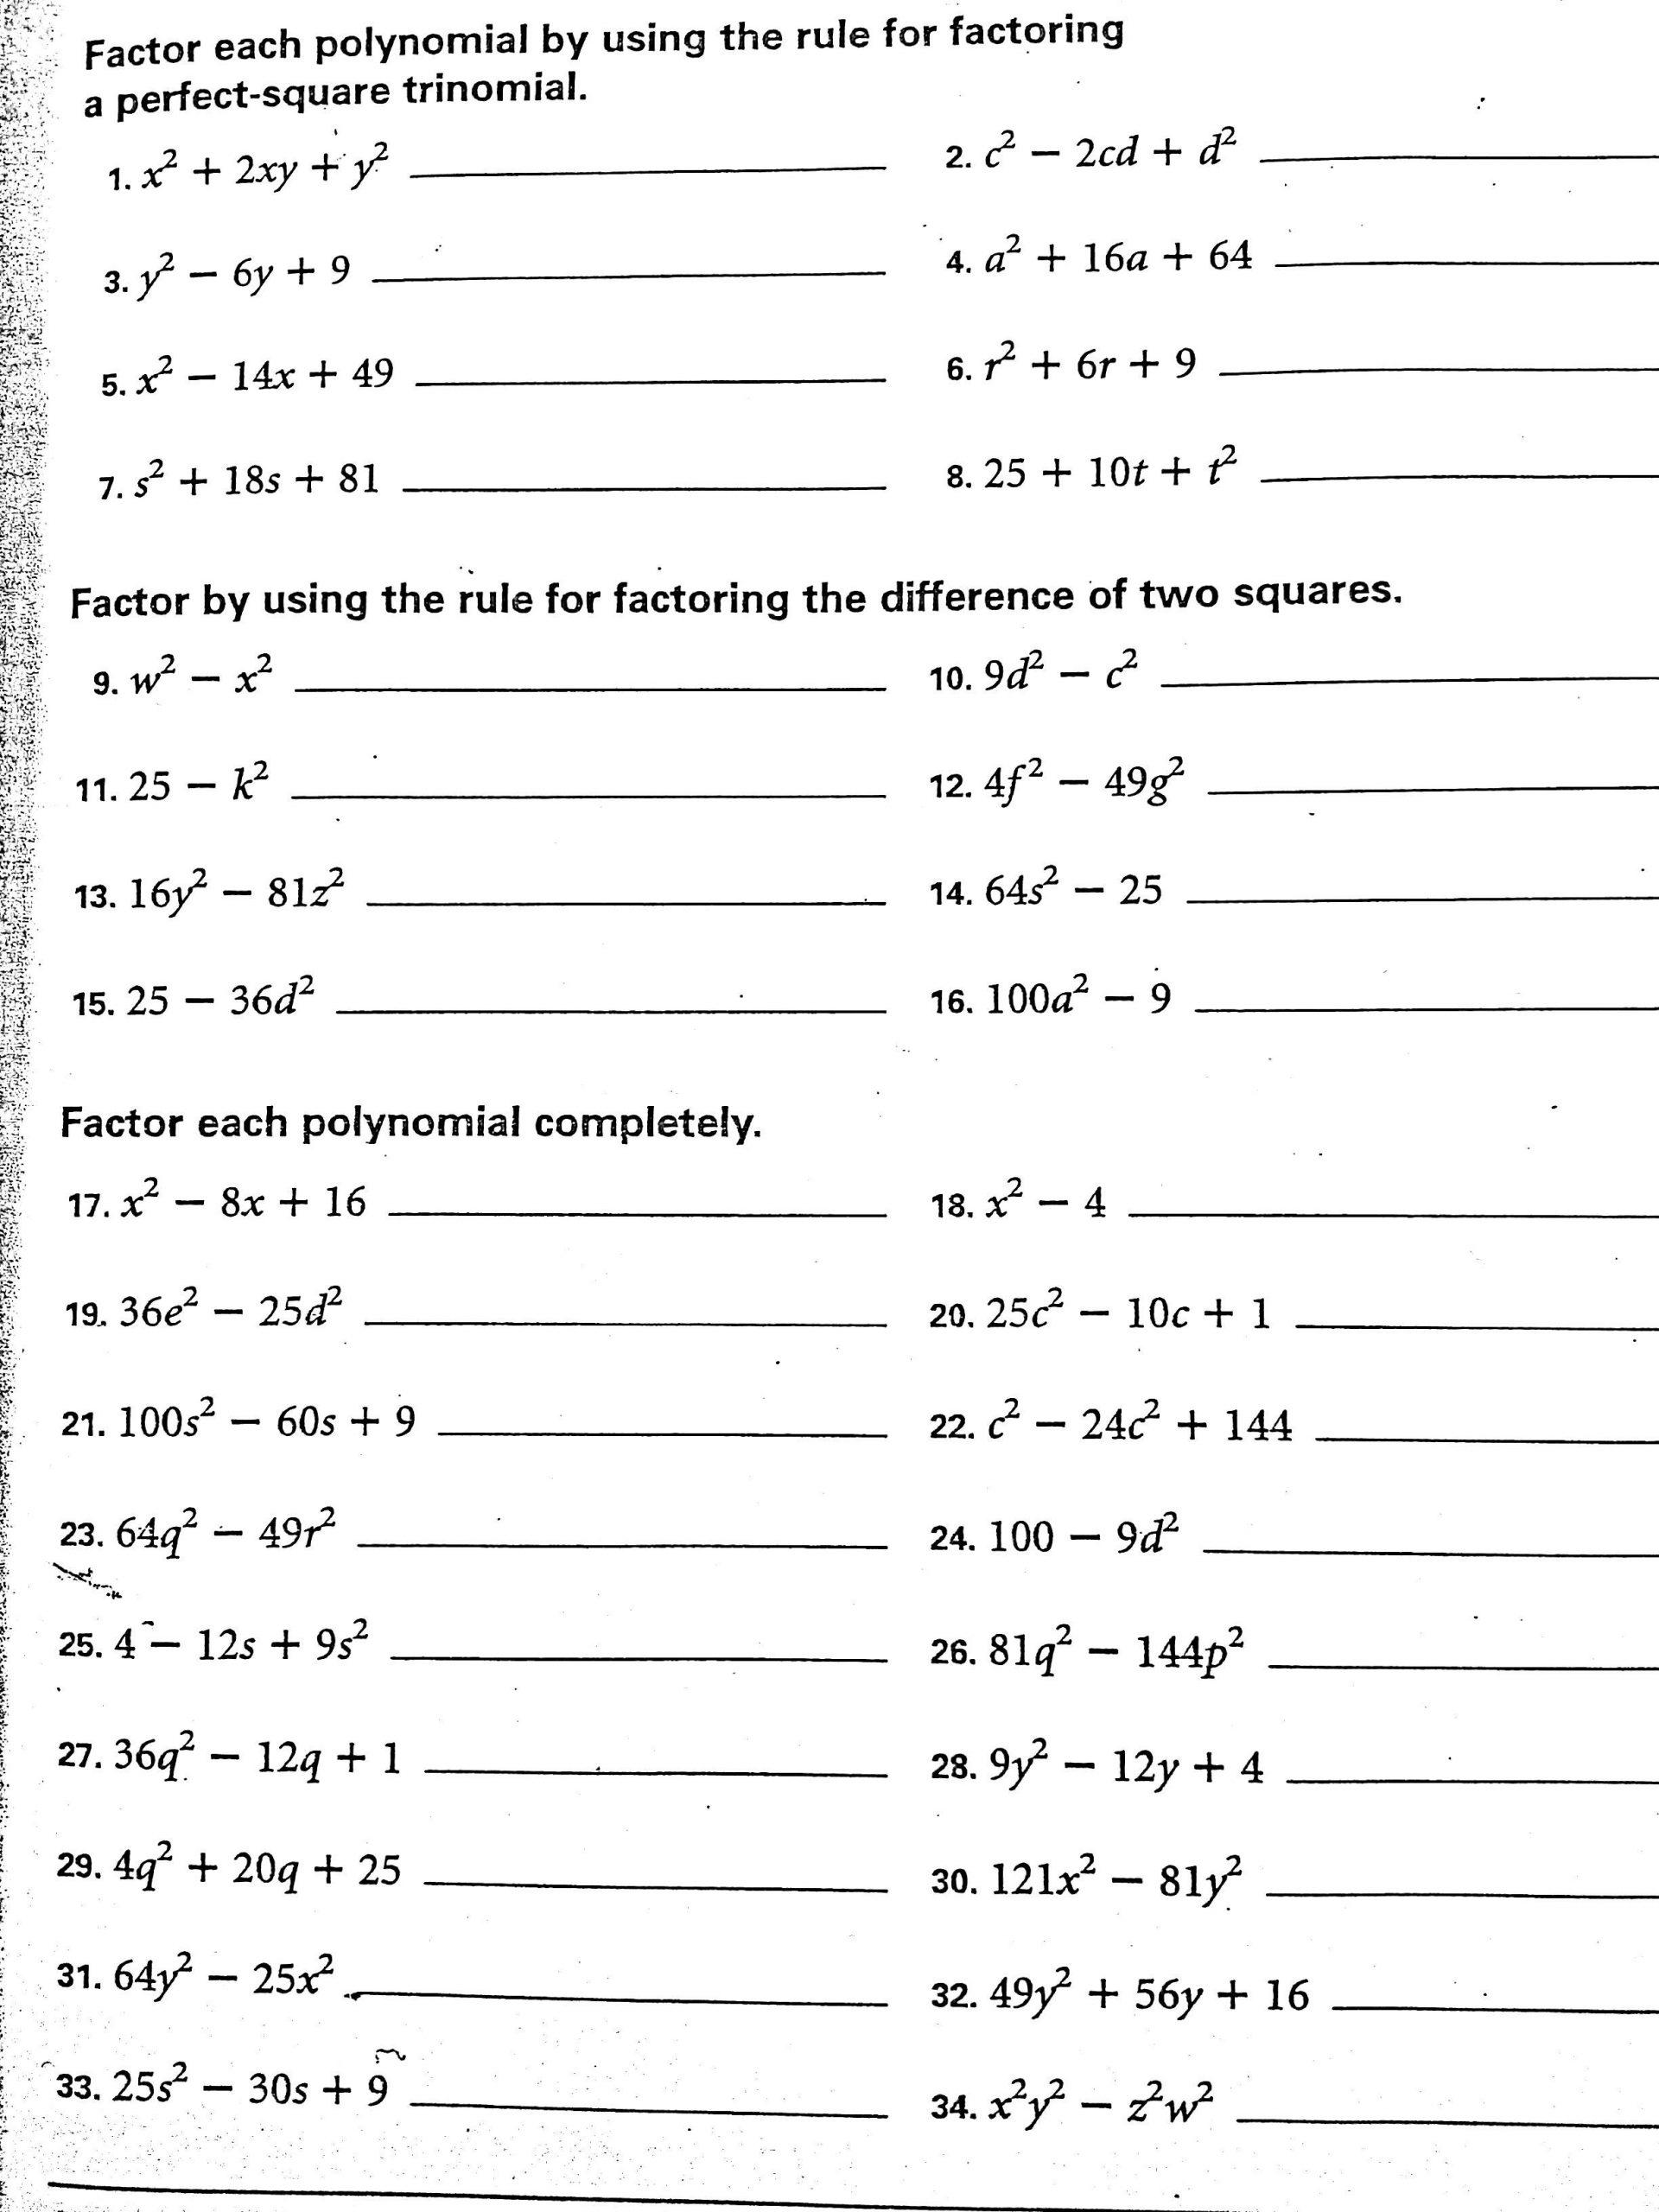 Factoring Special Cases Worksheet Factoring Tricky Trinomials Worksheet